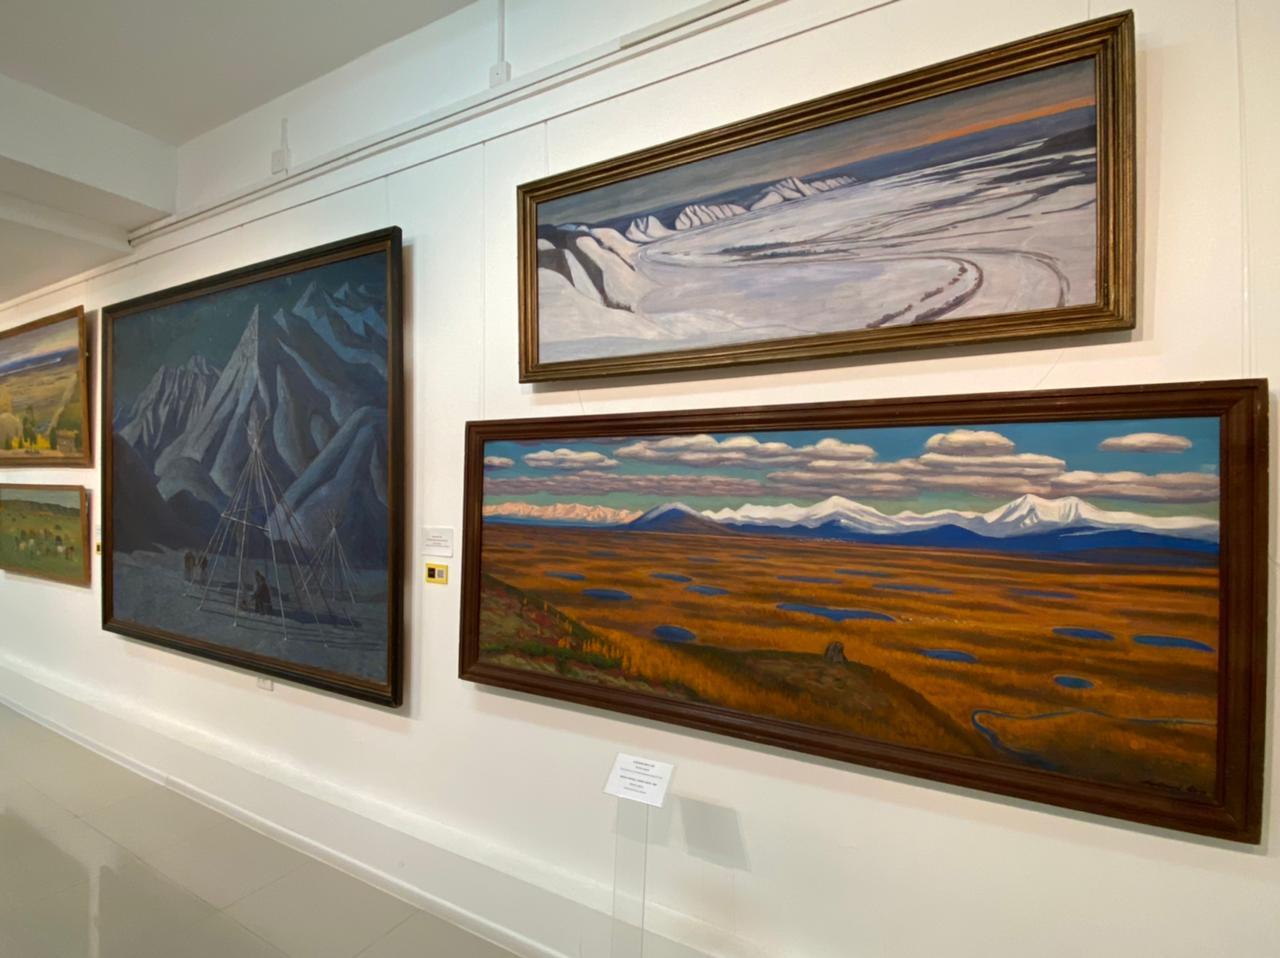 Экспозиция якутского художника Афанасия Осипова загружена на платформу «Артефакт»